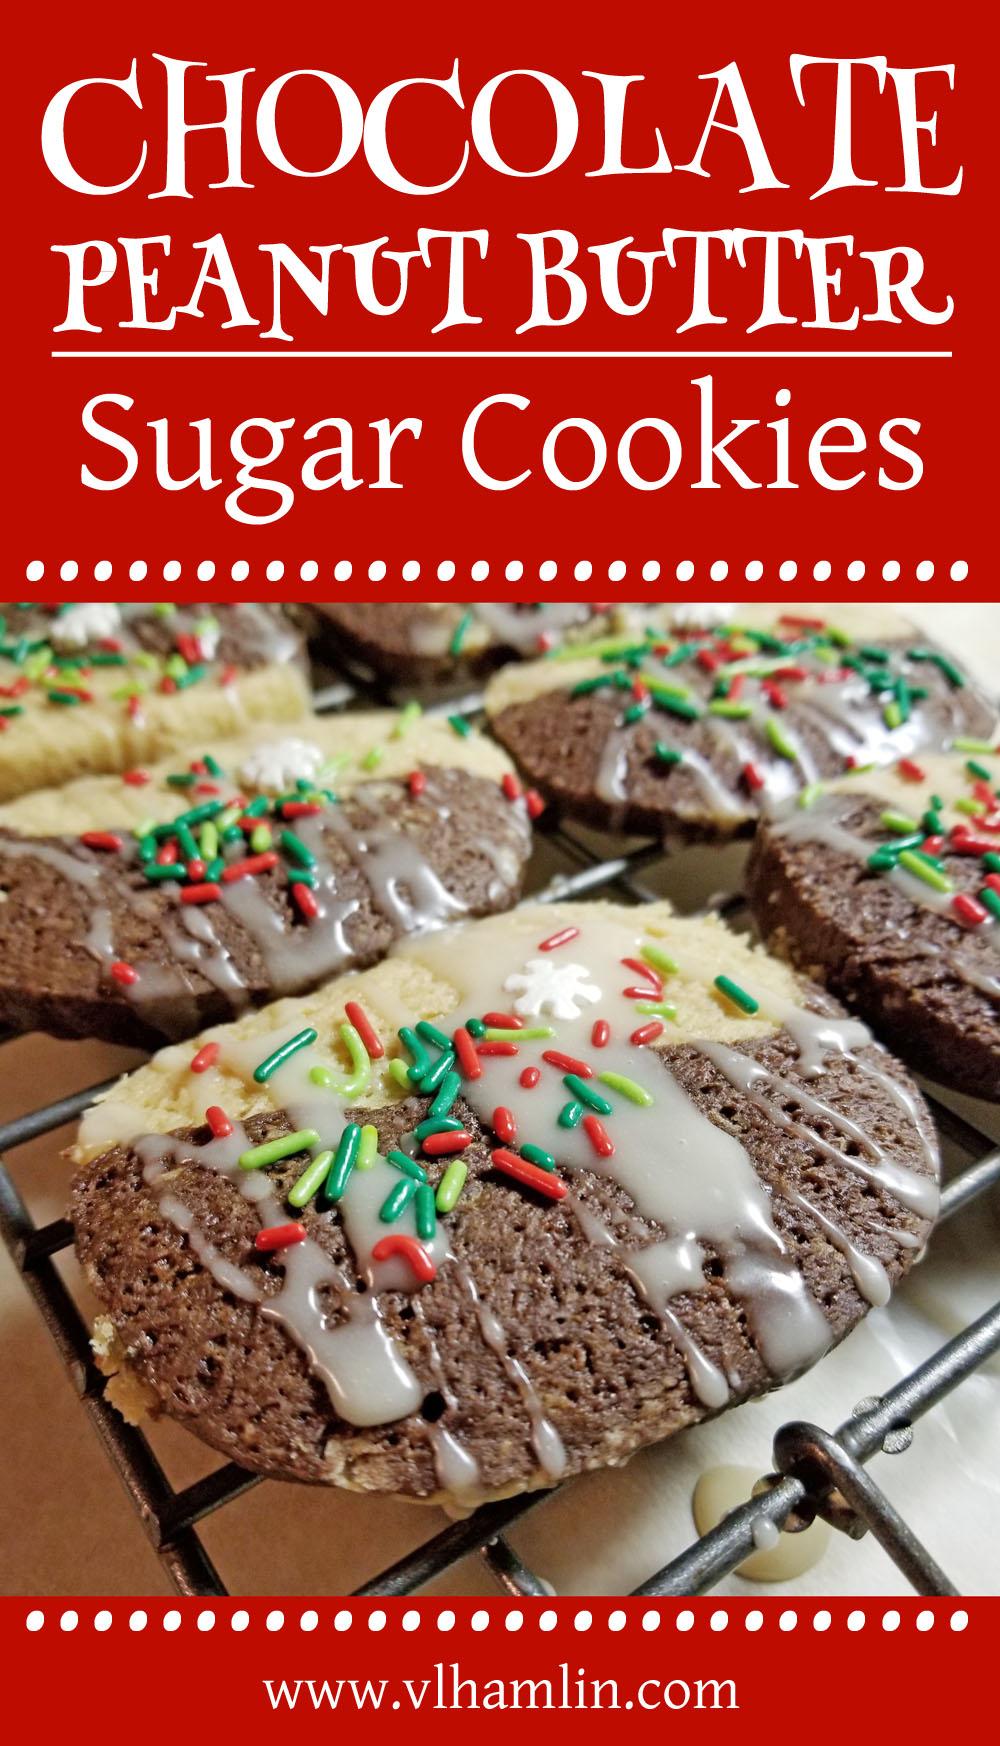 Chocolate Peanut Butter Sugar Cookies